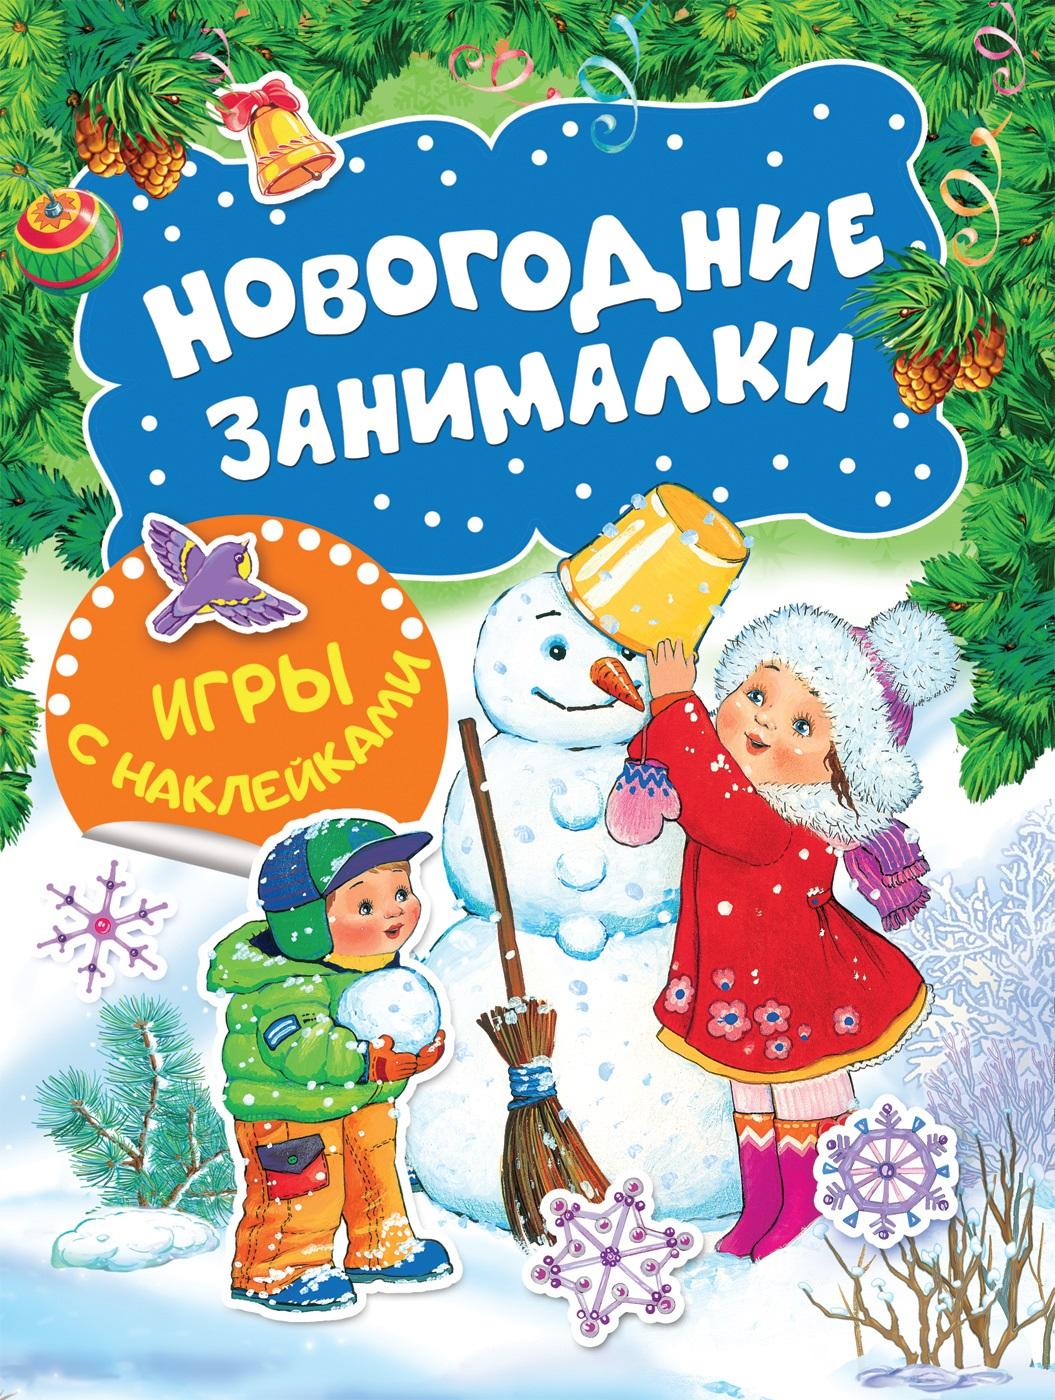 Котятова Н. И. Новогодние занималки. Игры с наклейками (Снеговичок)